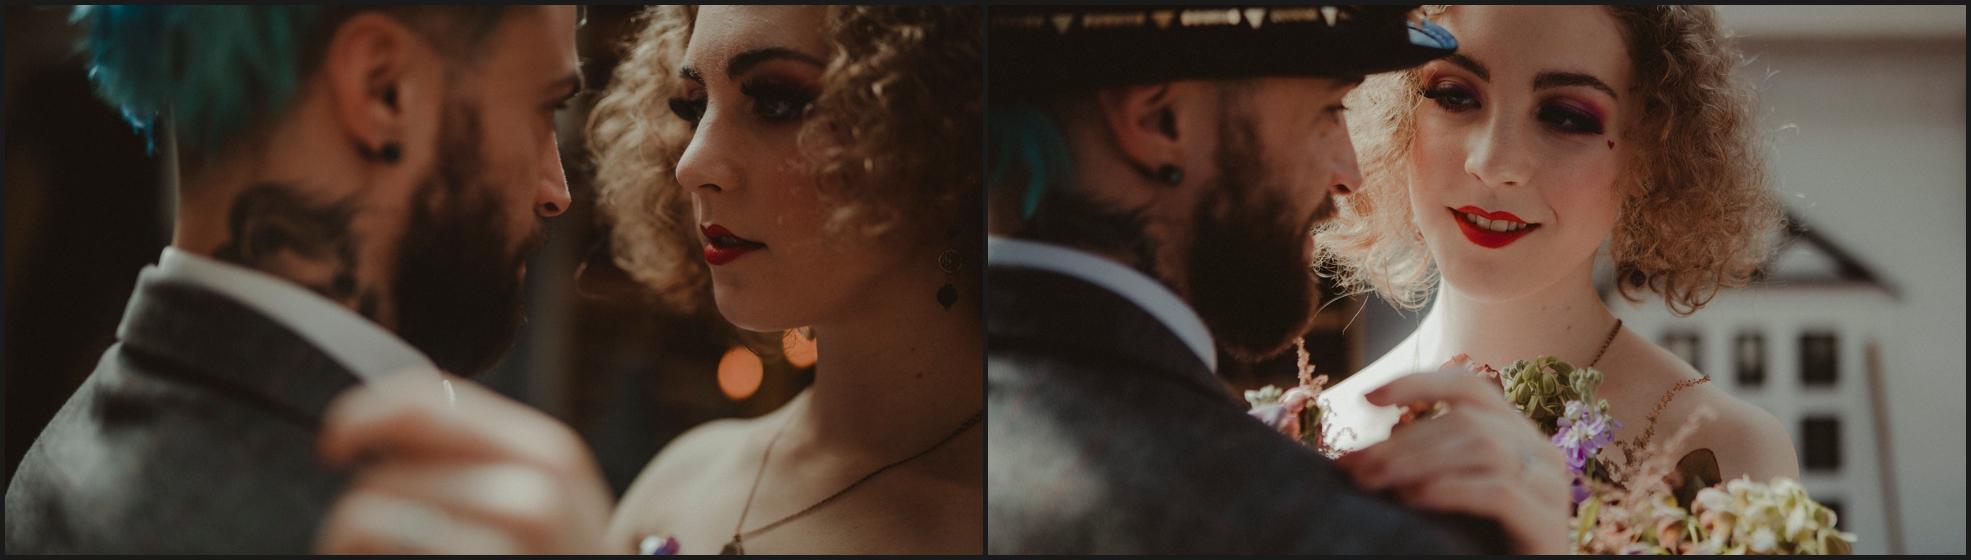 bride, groom, steampunk wedding, alternative wedding photographer, London, intimate, wedding photographer, smile